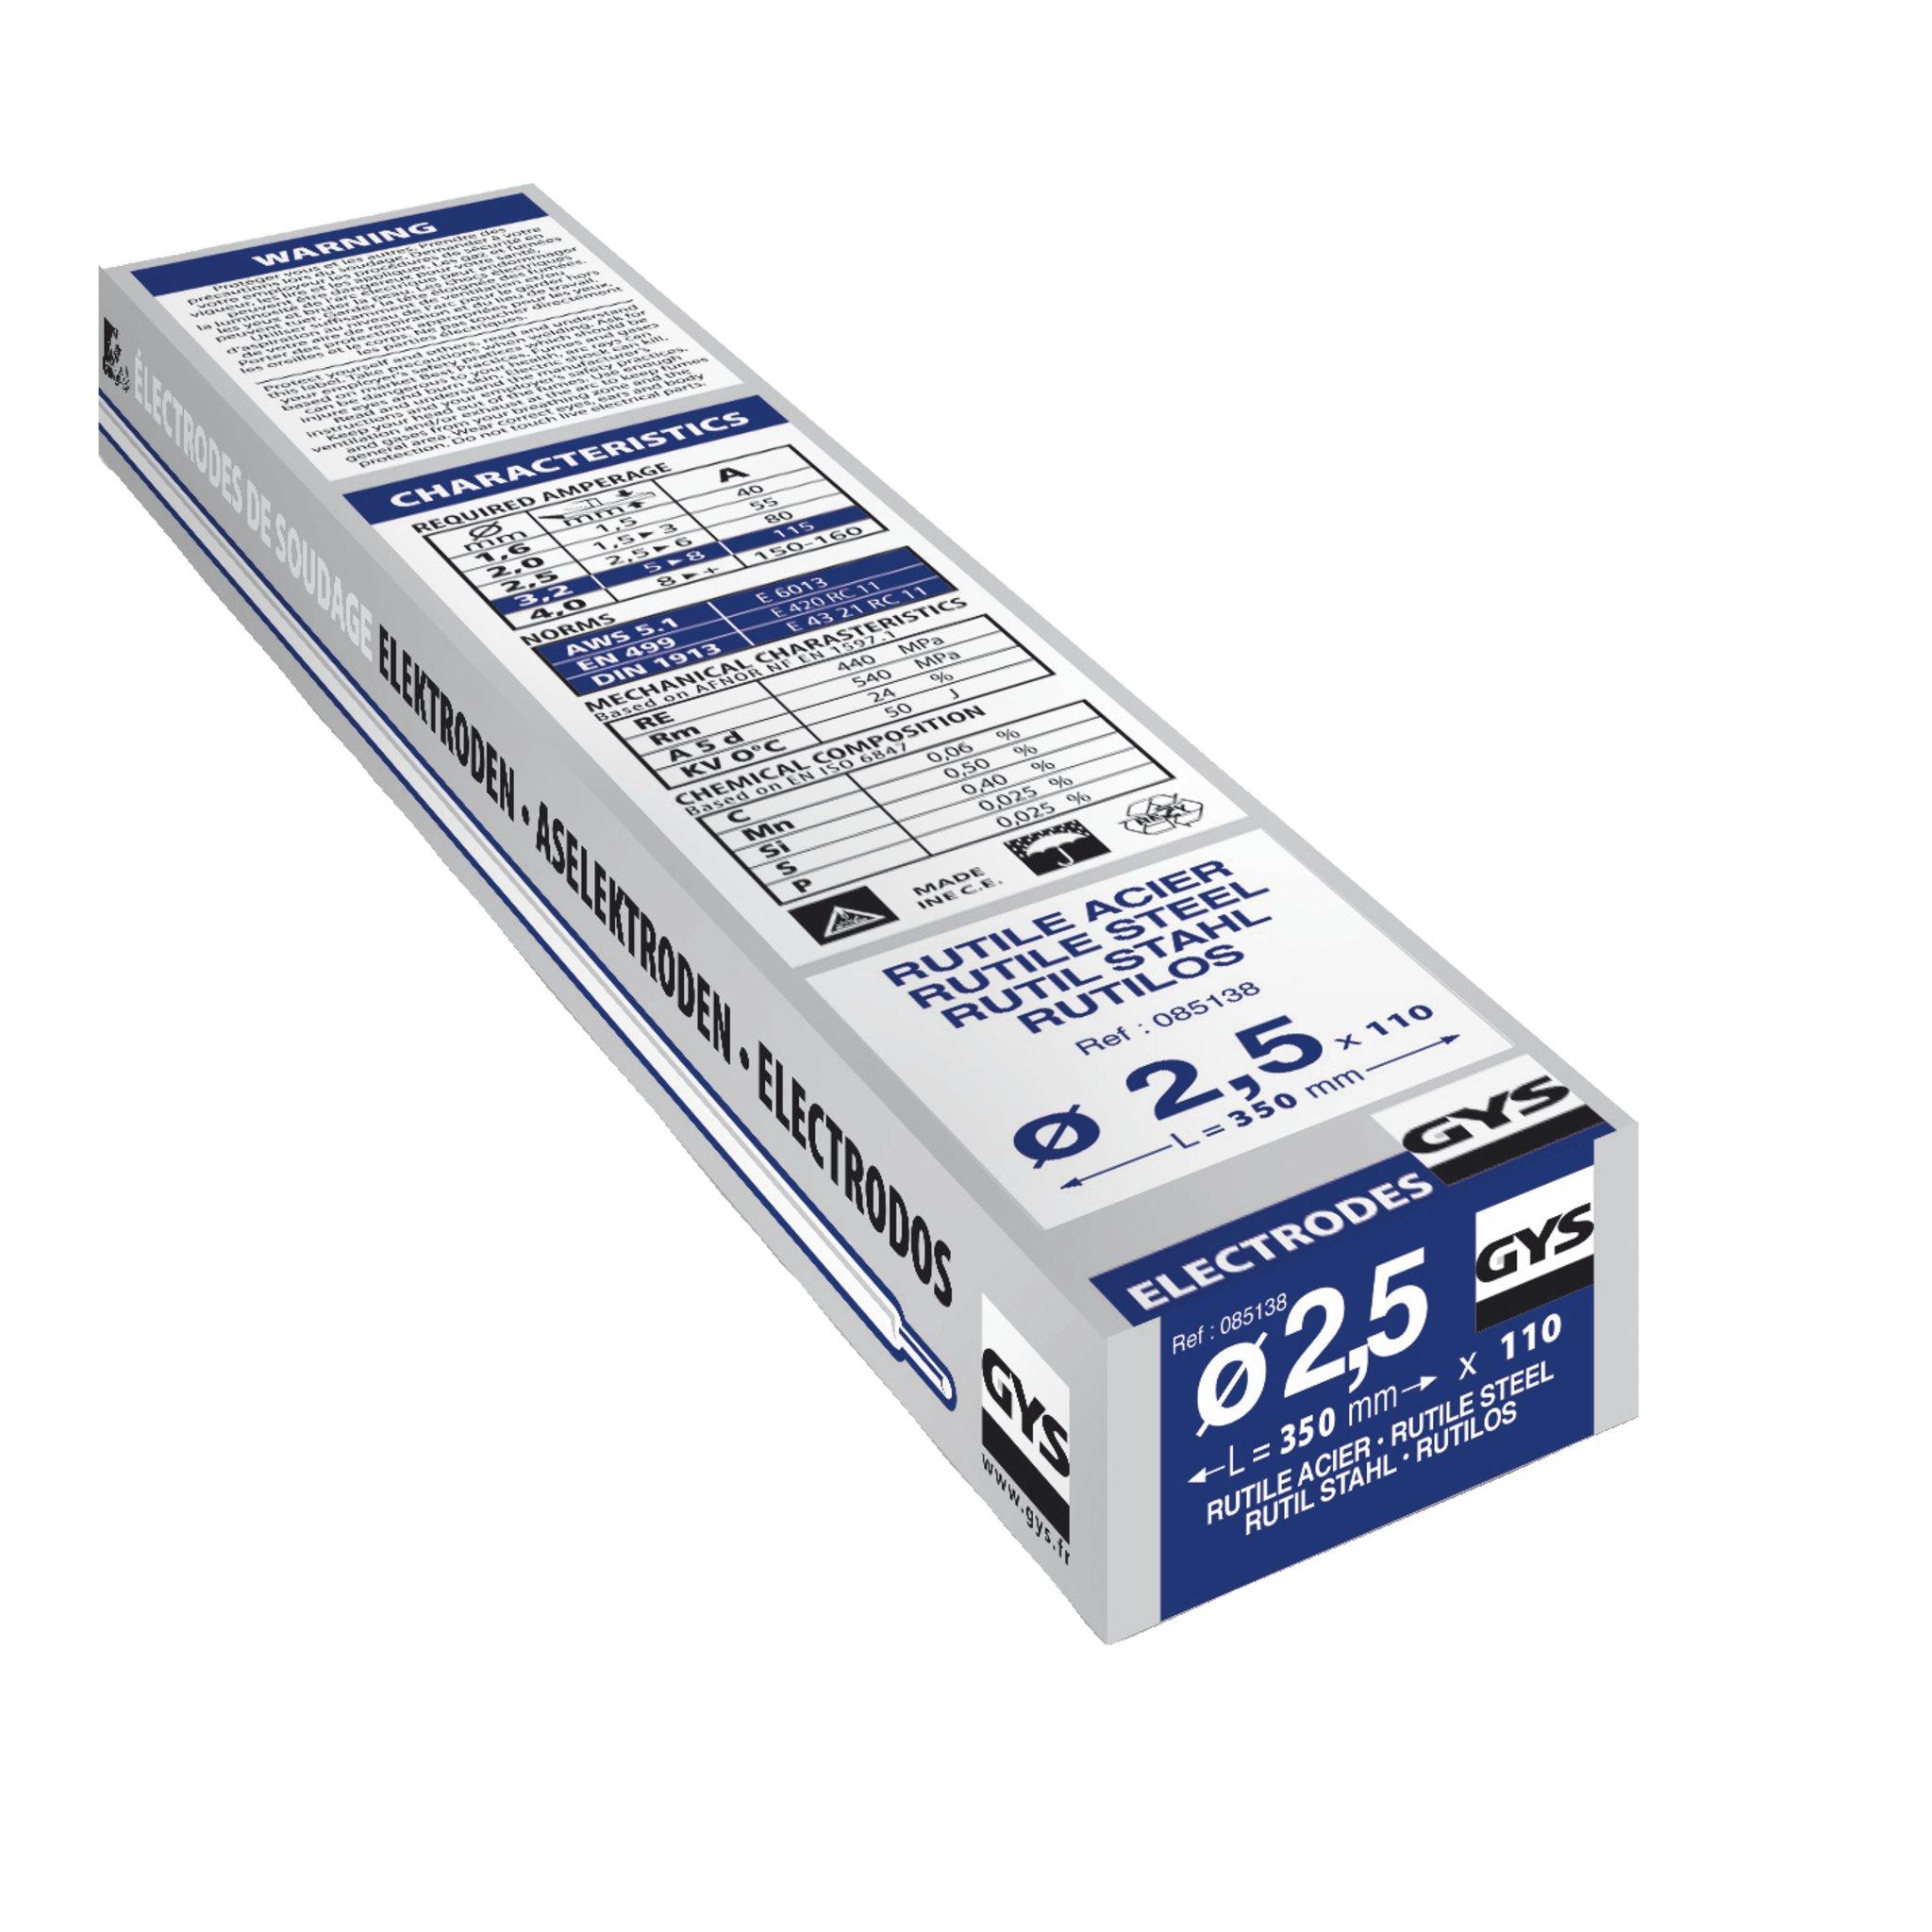 Gys - Electrodos para soldadura (110 x 2,5 mm) product image